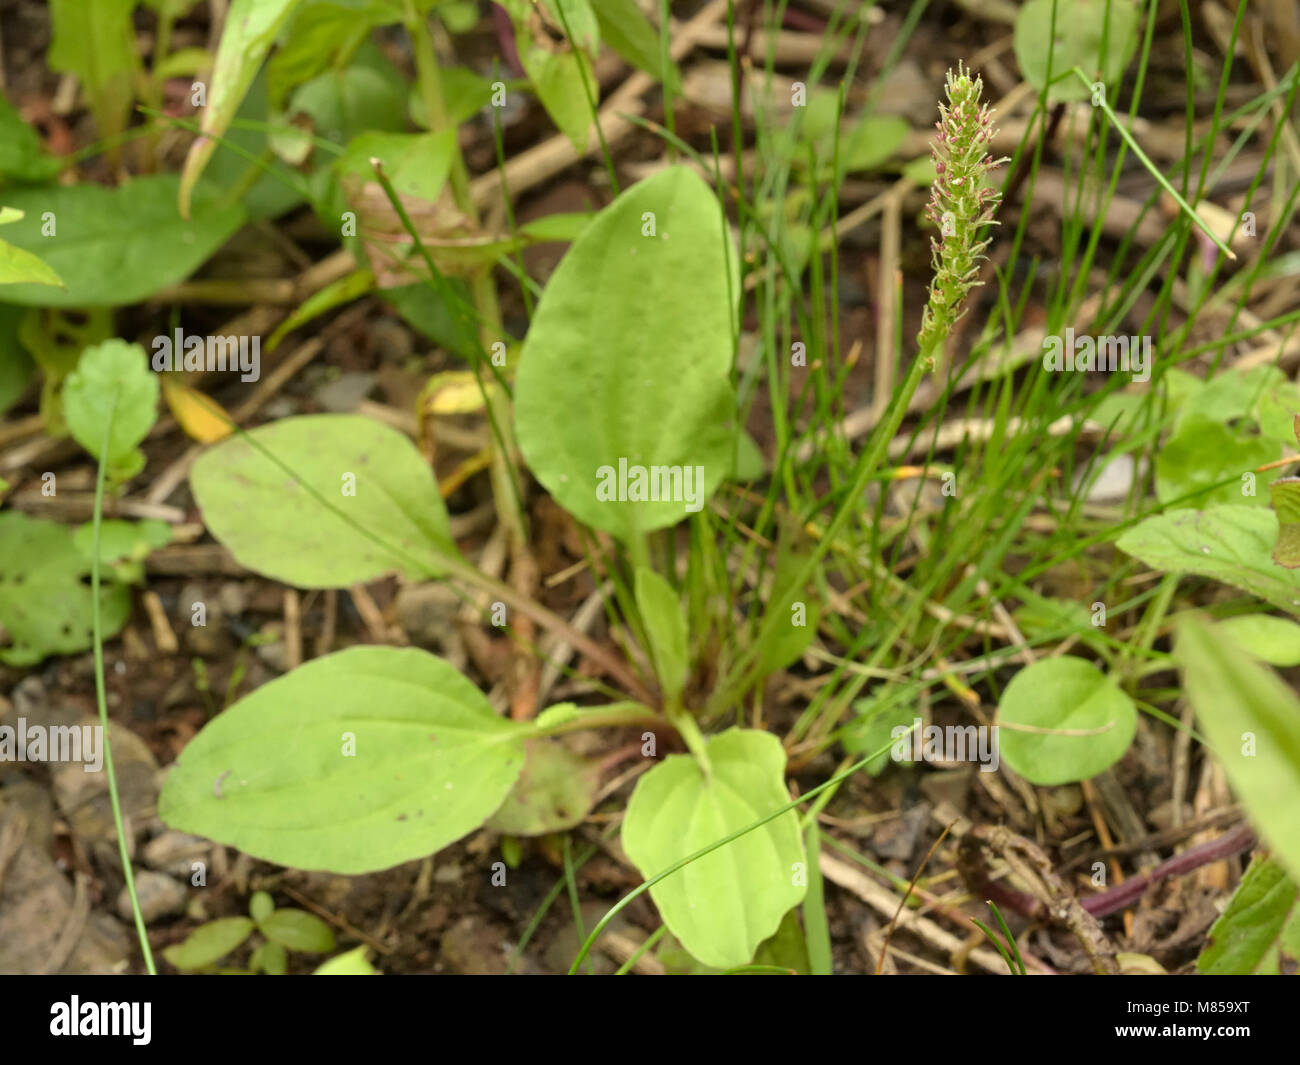 Greater Plantain (subspecies intermedia), Plantago major subspecies intermedia - Stock Image